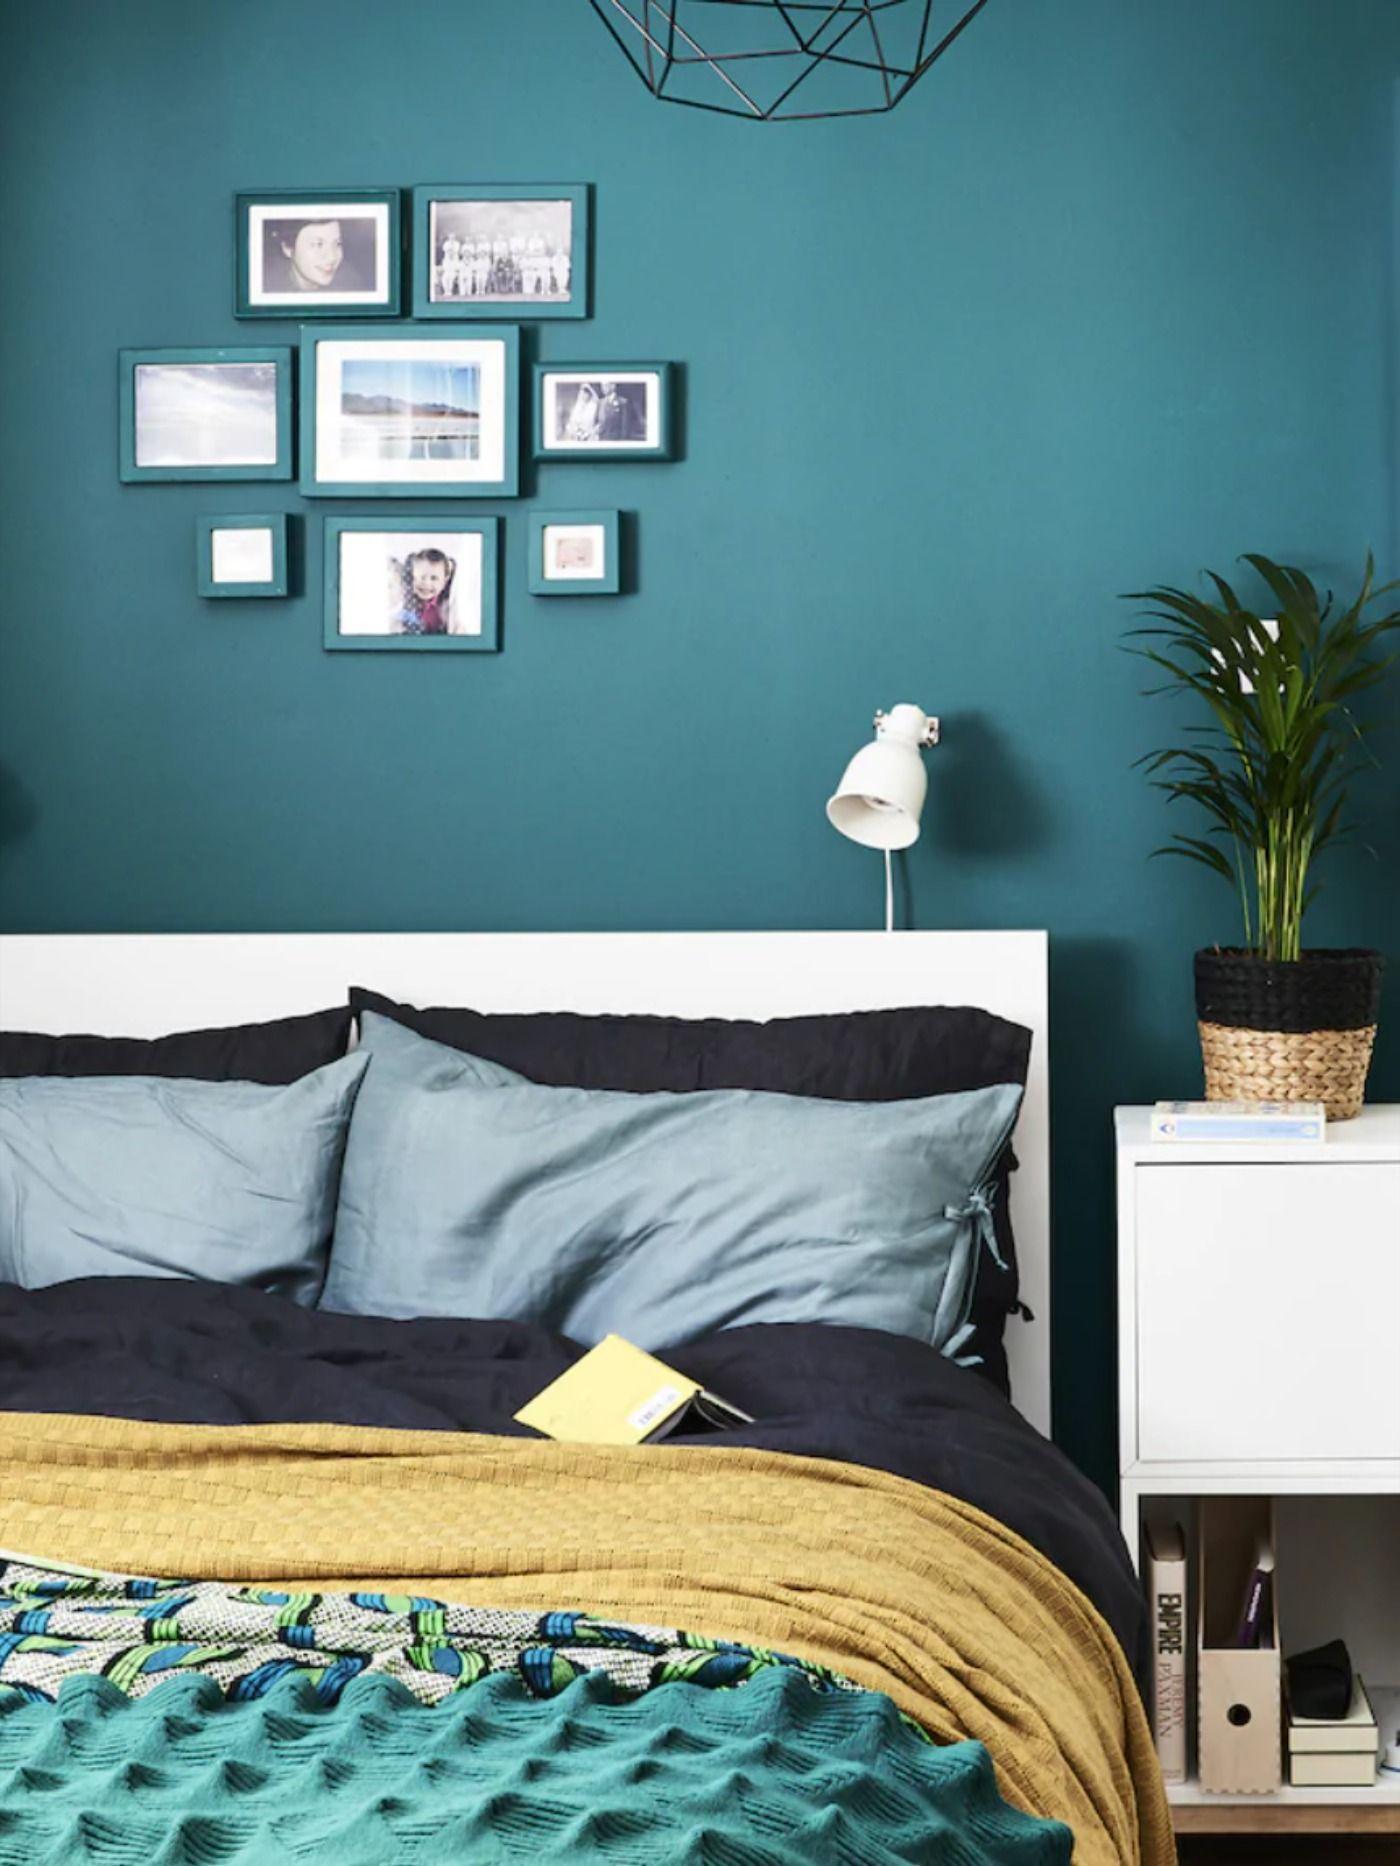 غرف نوم ايكيا صغيرة Cozy Small Bedrooms Simple Bedroom Small Bedroom Furniture